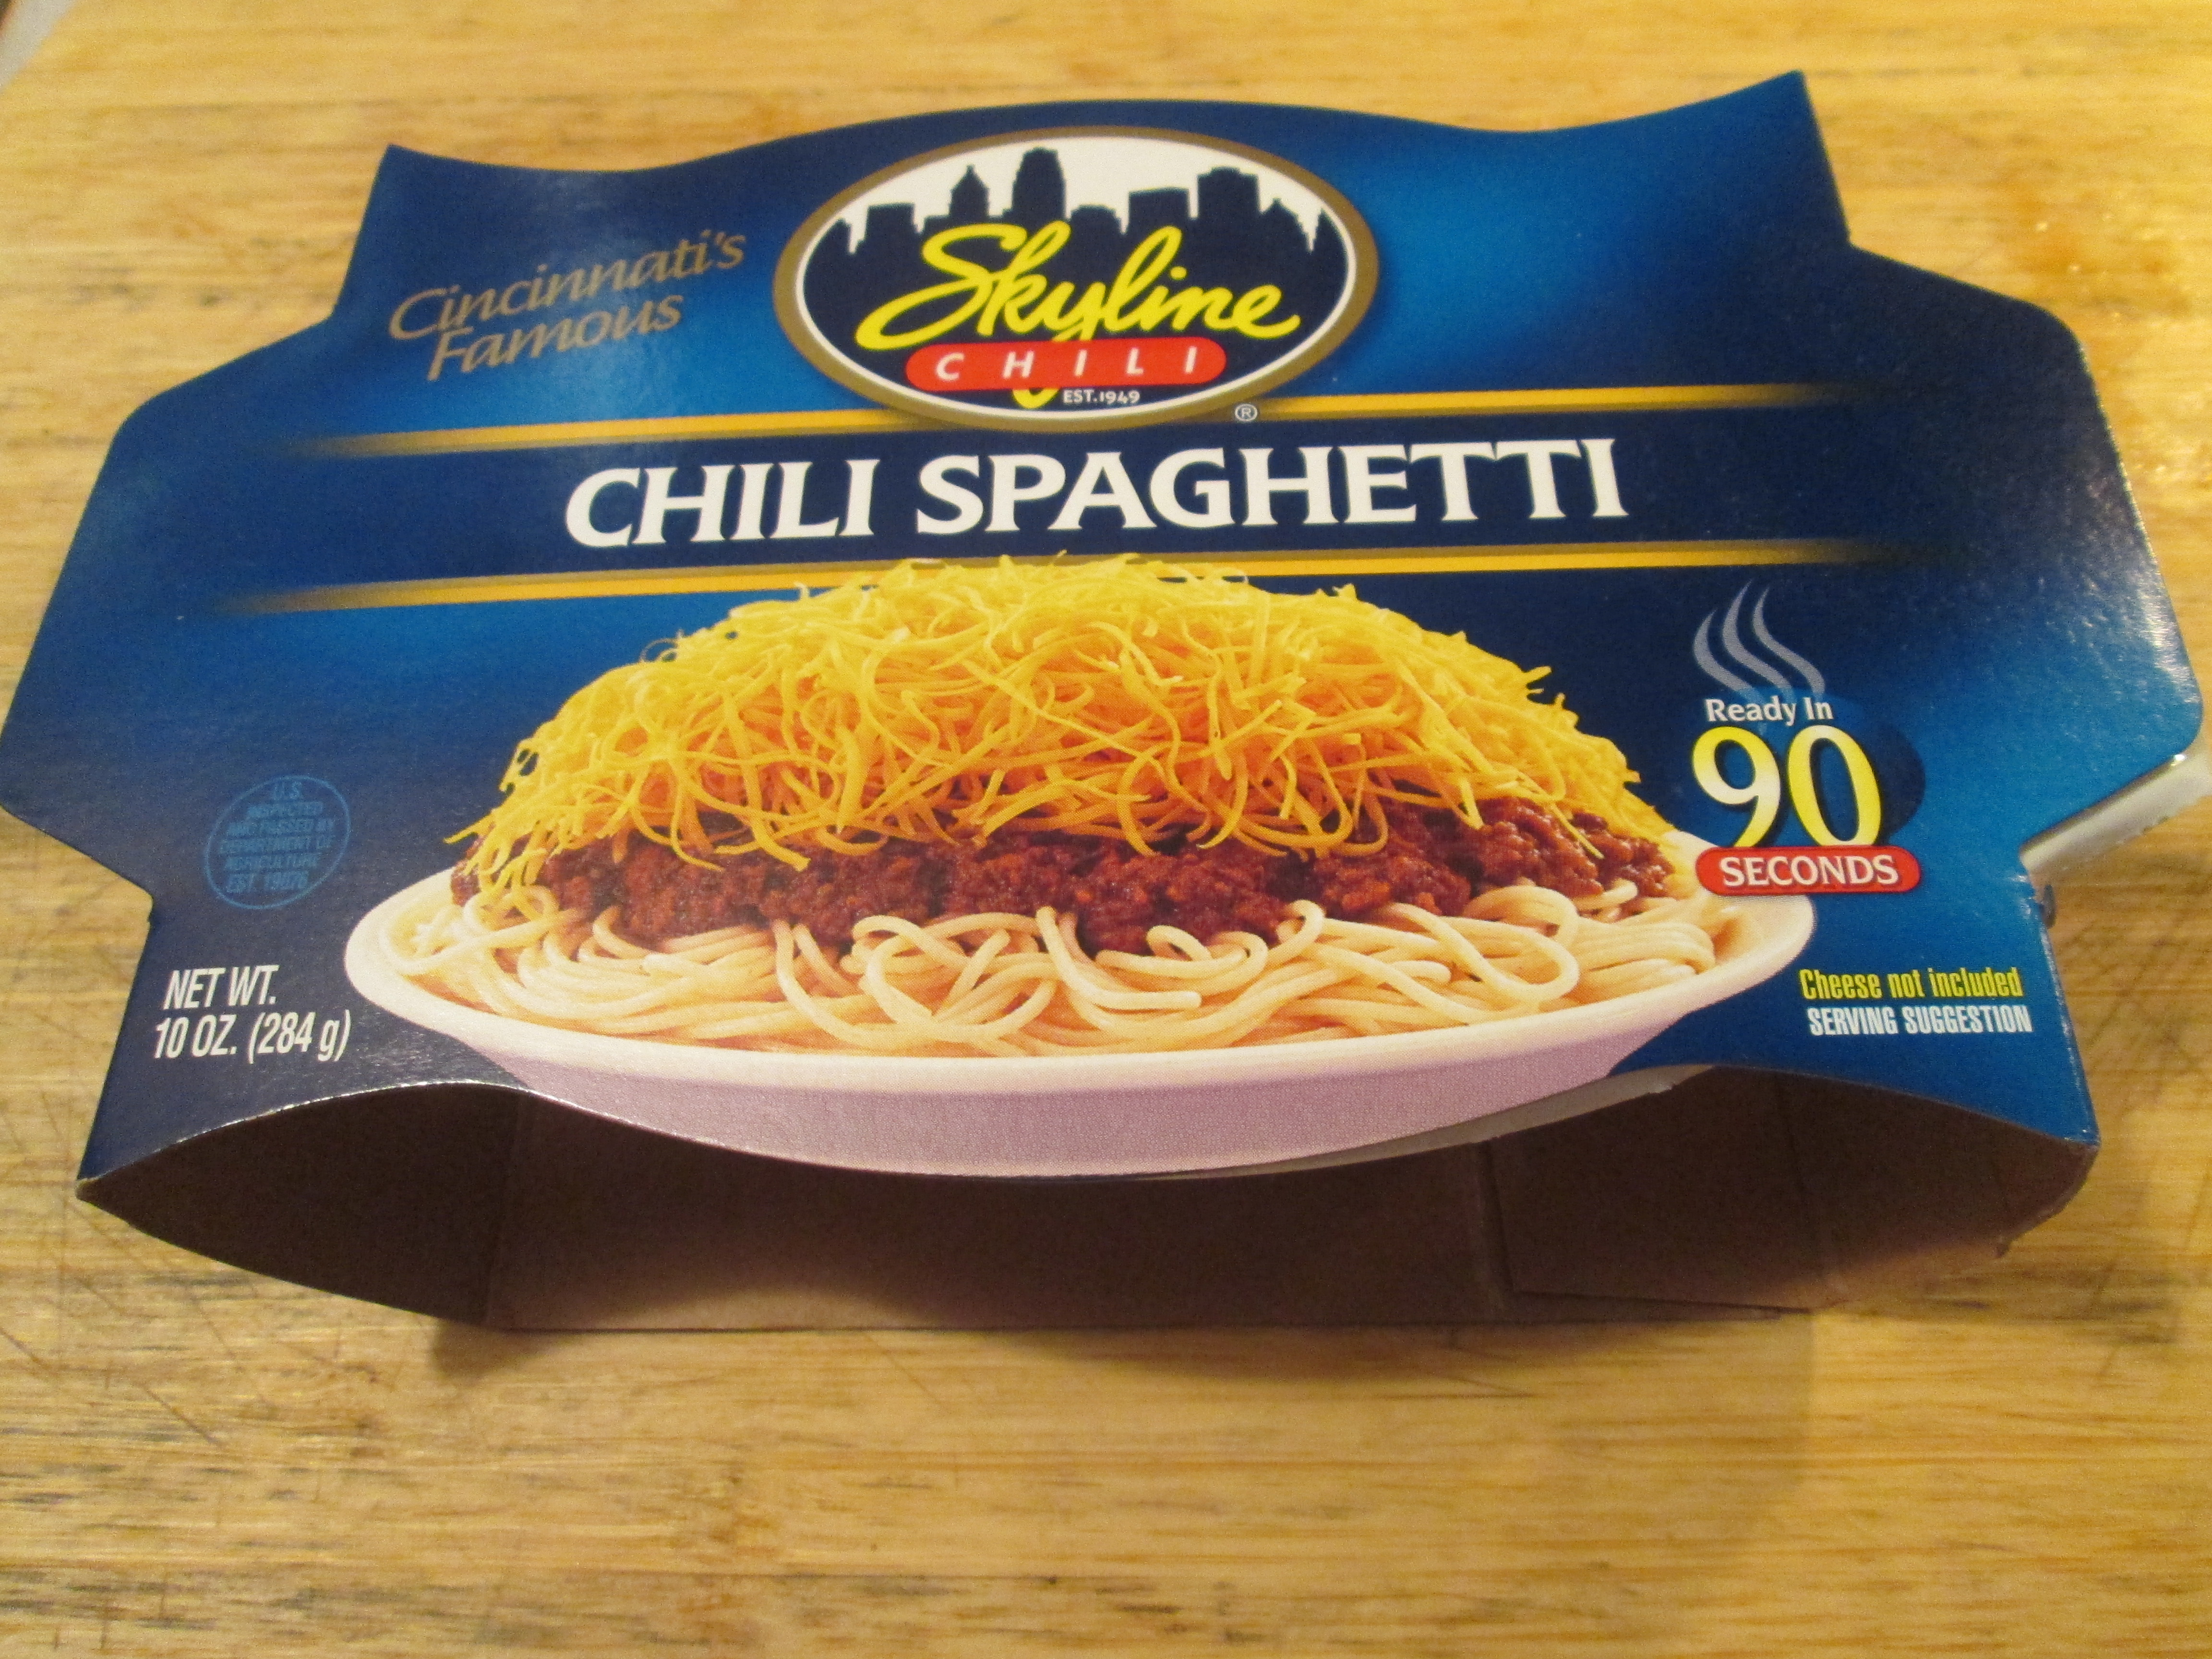 Skyline Chili Hot Dog Calories